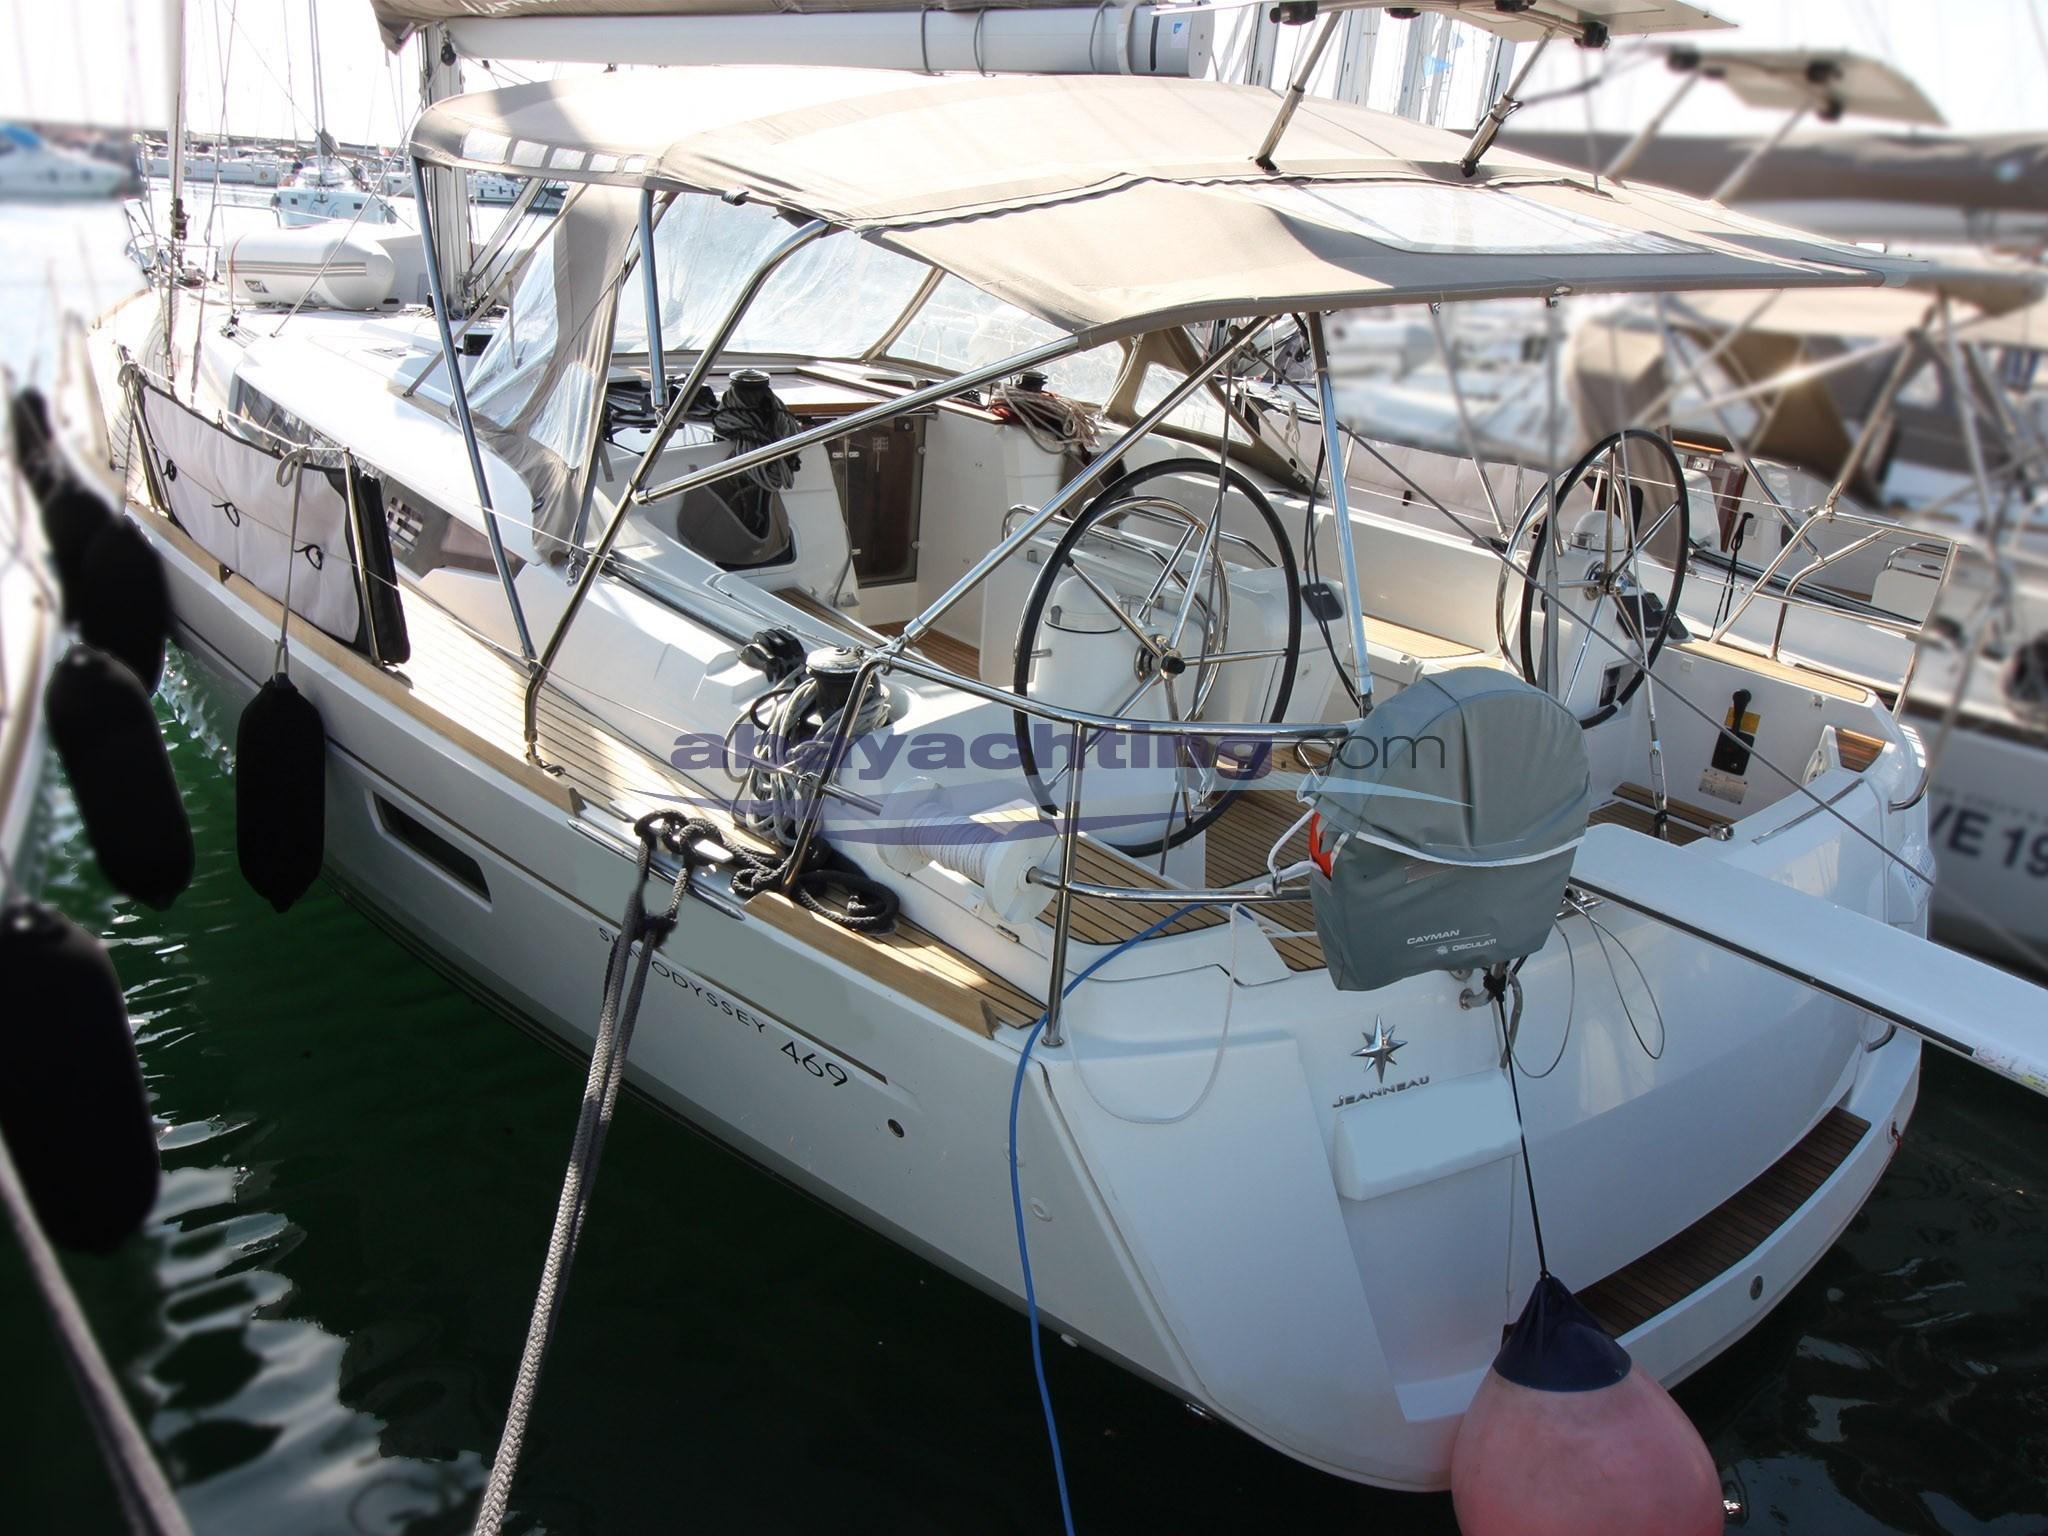 New arrival Jeanneau Sun Odyssey 469